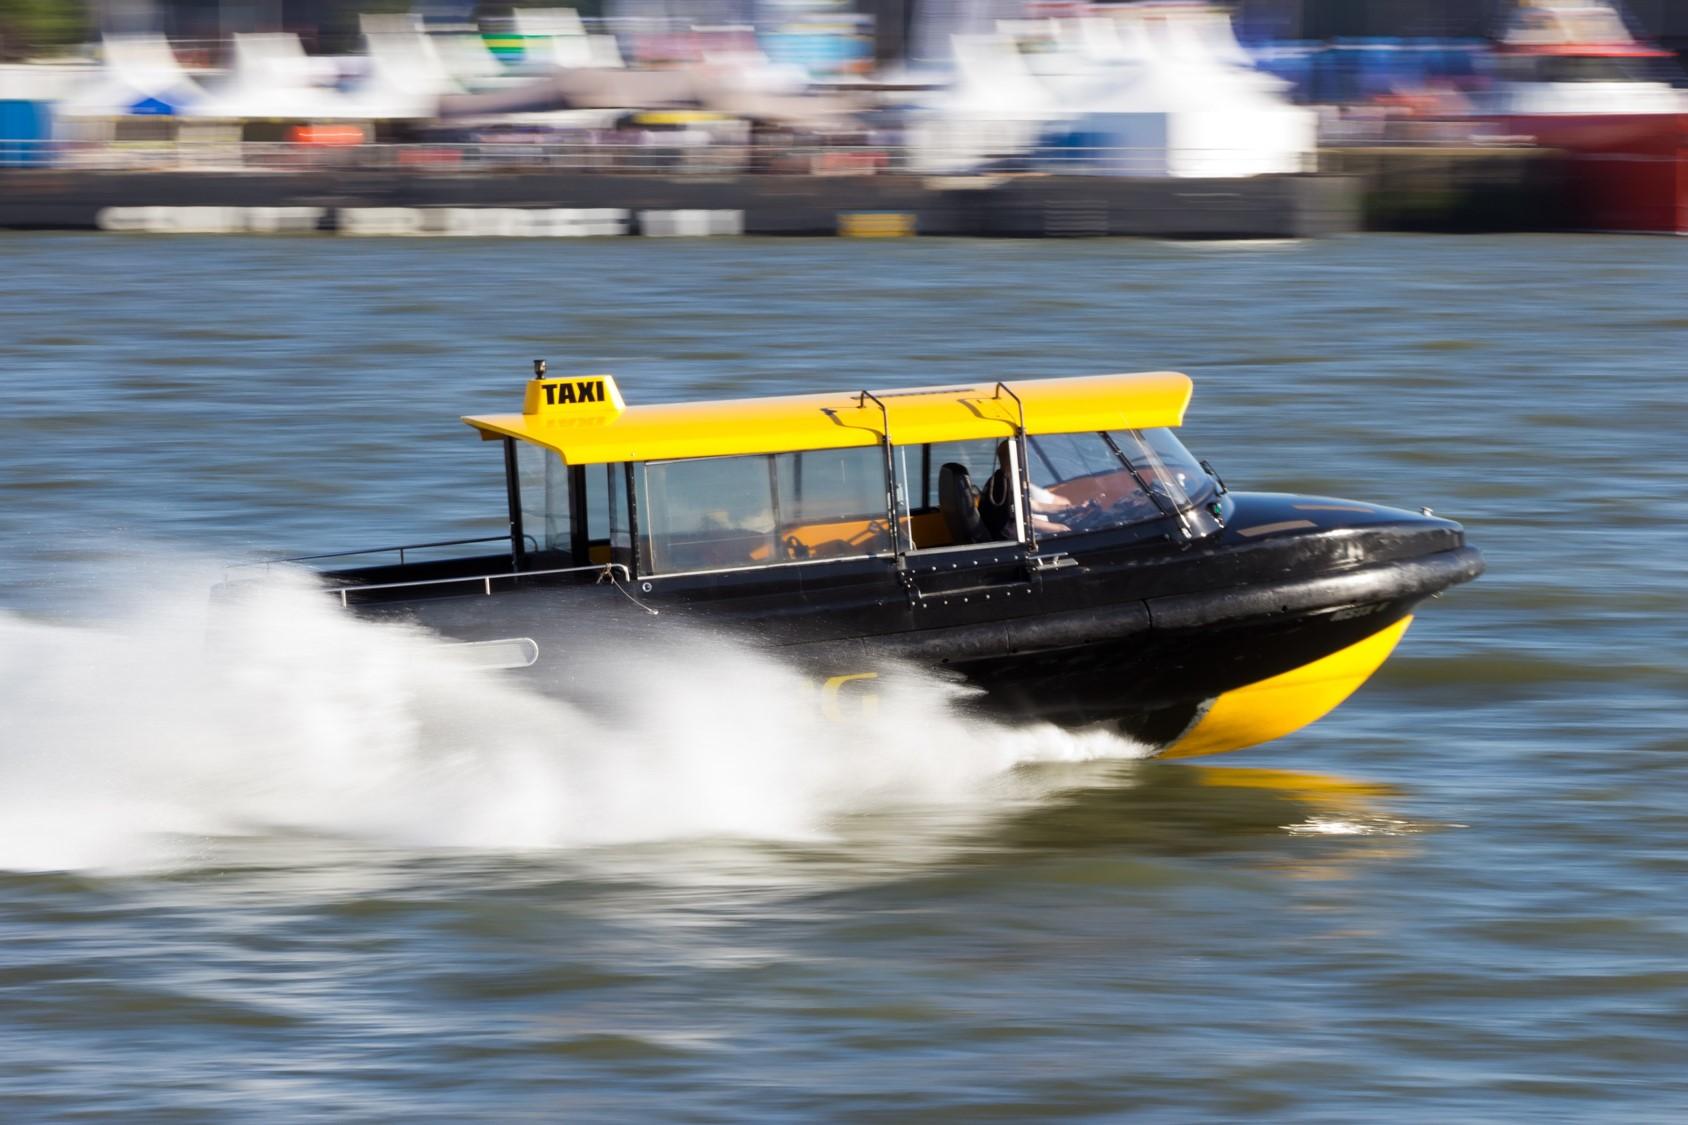 Watertaxi Mobil SHC 629